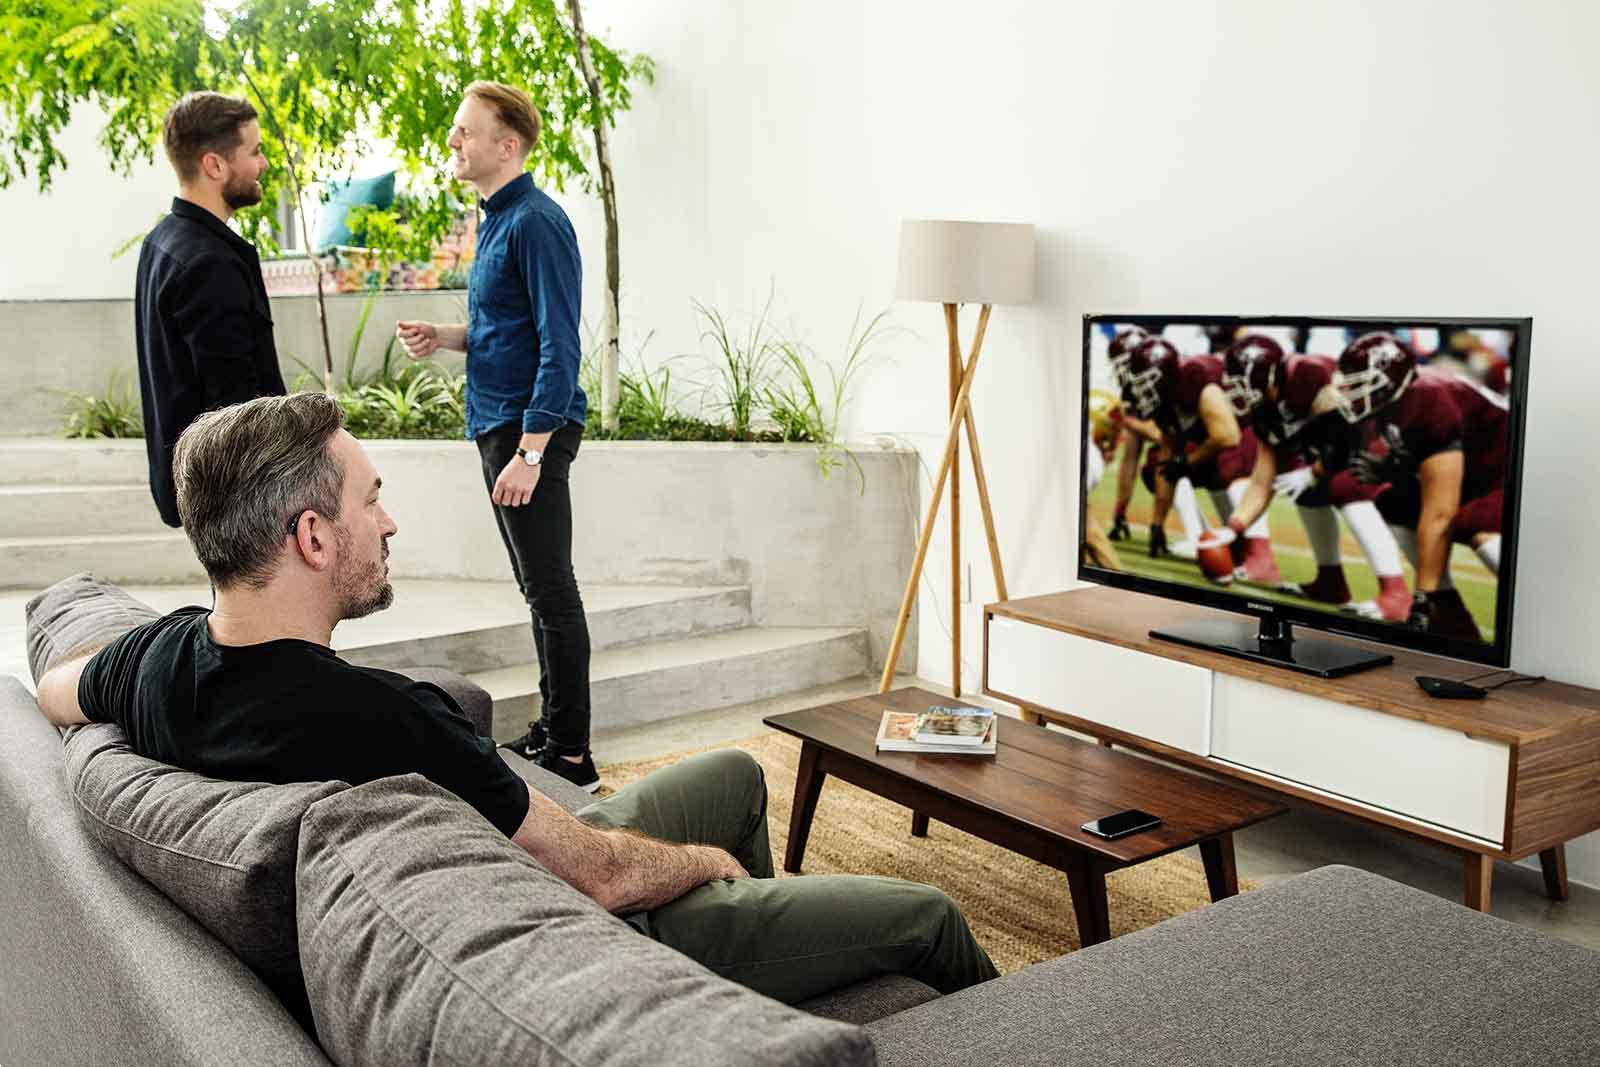 TV play